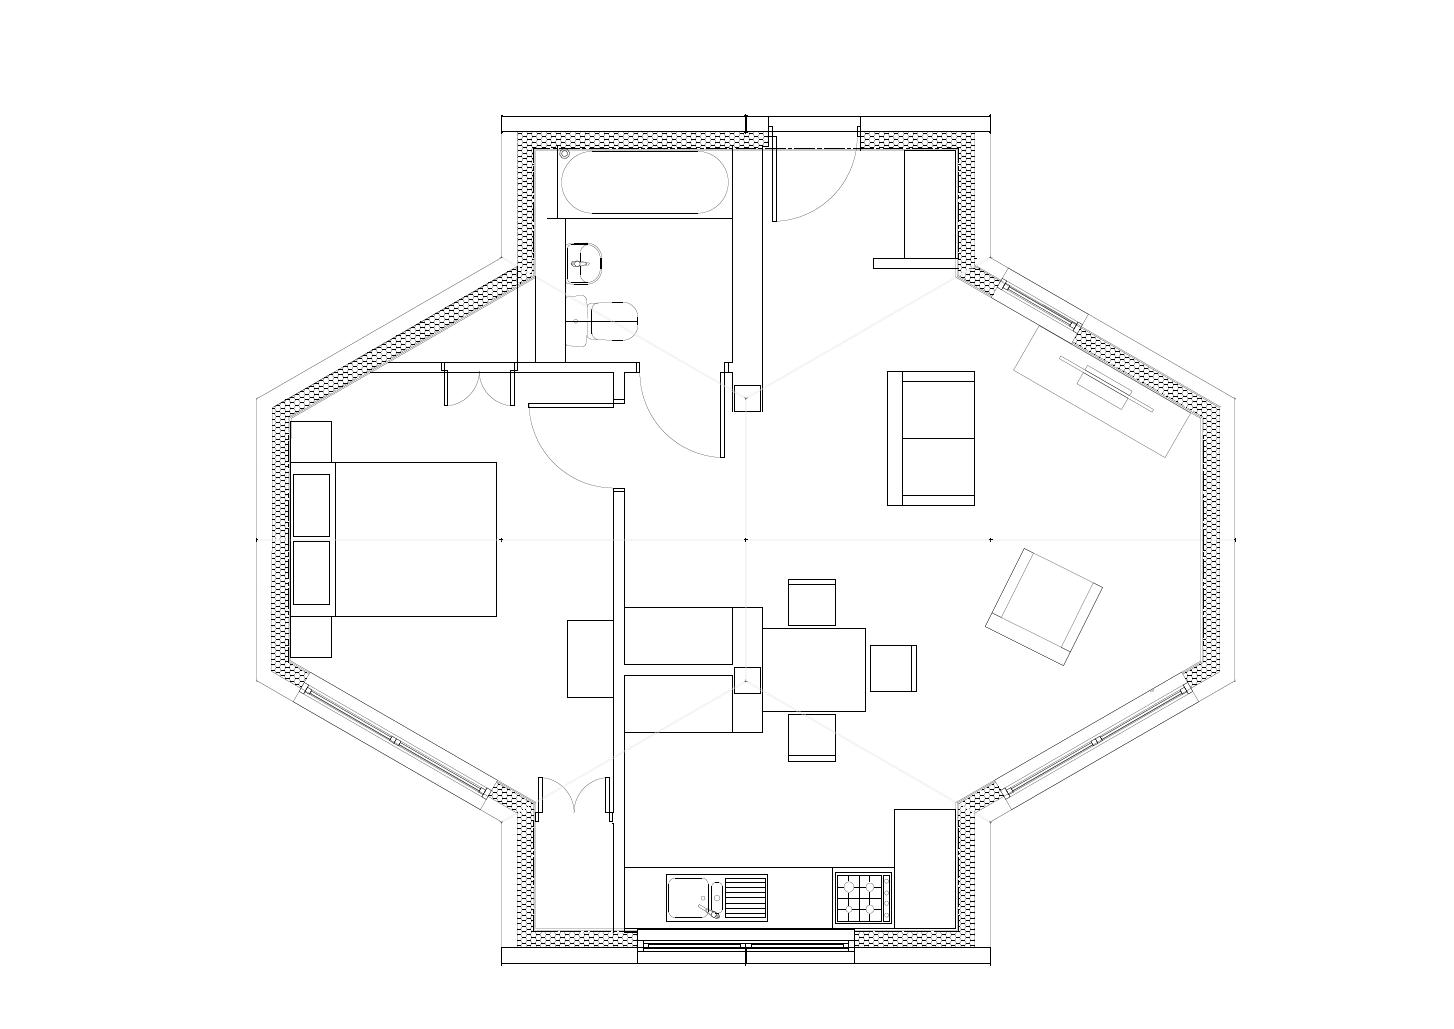 1 Bed 1 Batf Floorplan.png